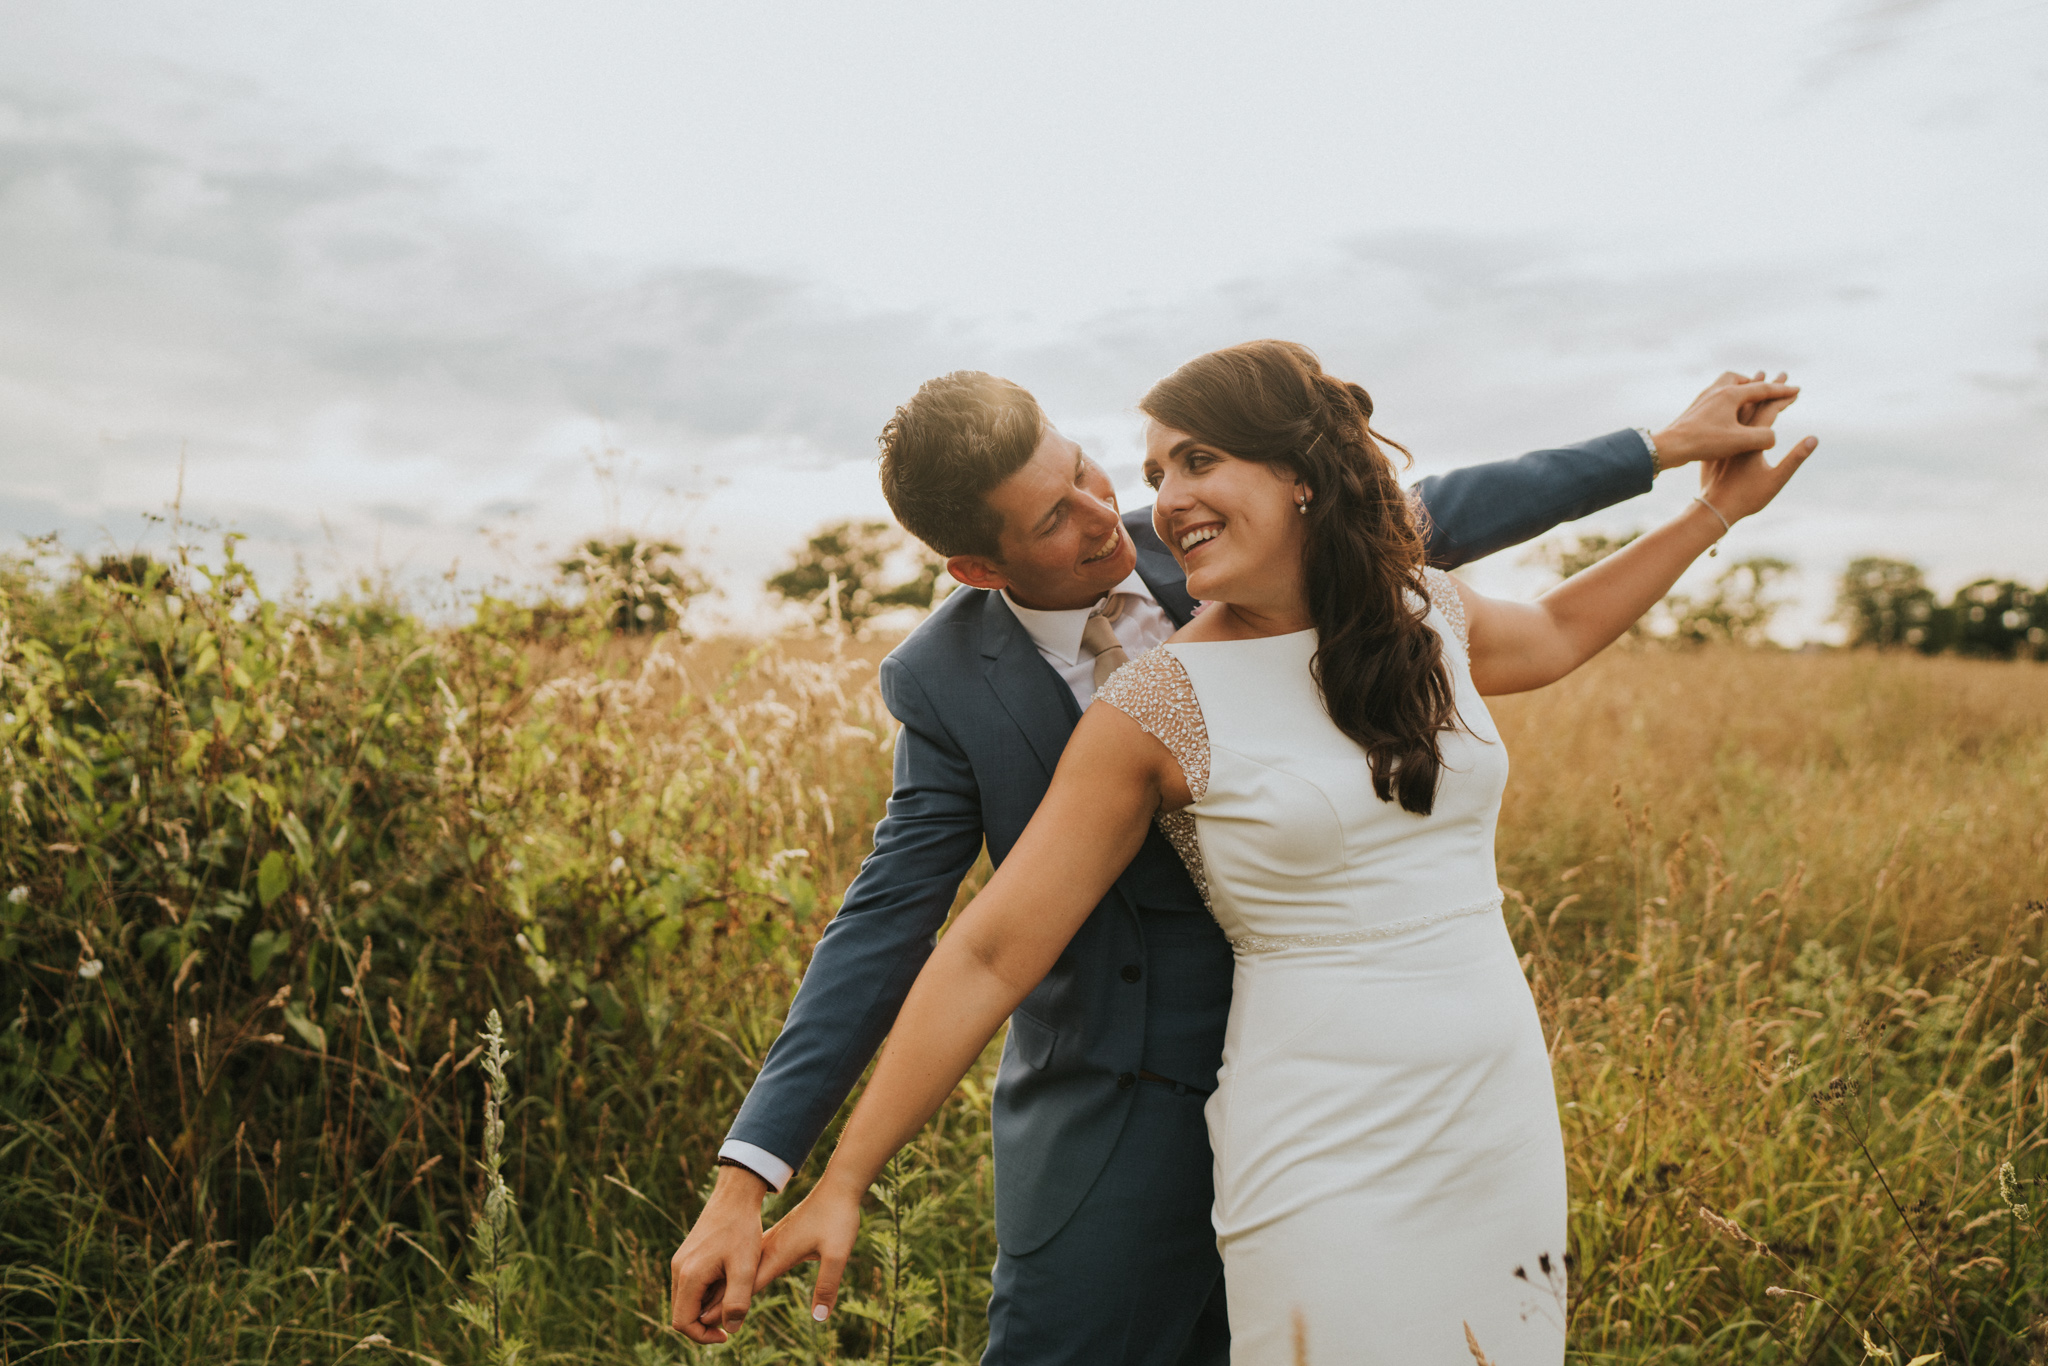 danielle-and-gareths-boho-wedding-previews-at-high-house-weddings-grace-elizabeth-colchester-essex-suffolk-norfolk-devon-alternative-wedding-and-lifestyle-photographer (64 of 76).jpg